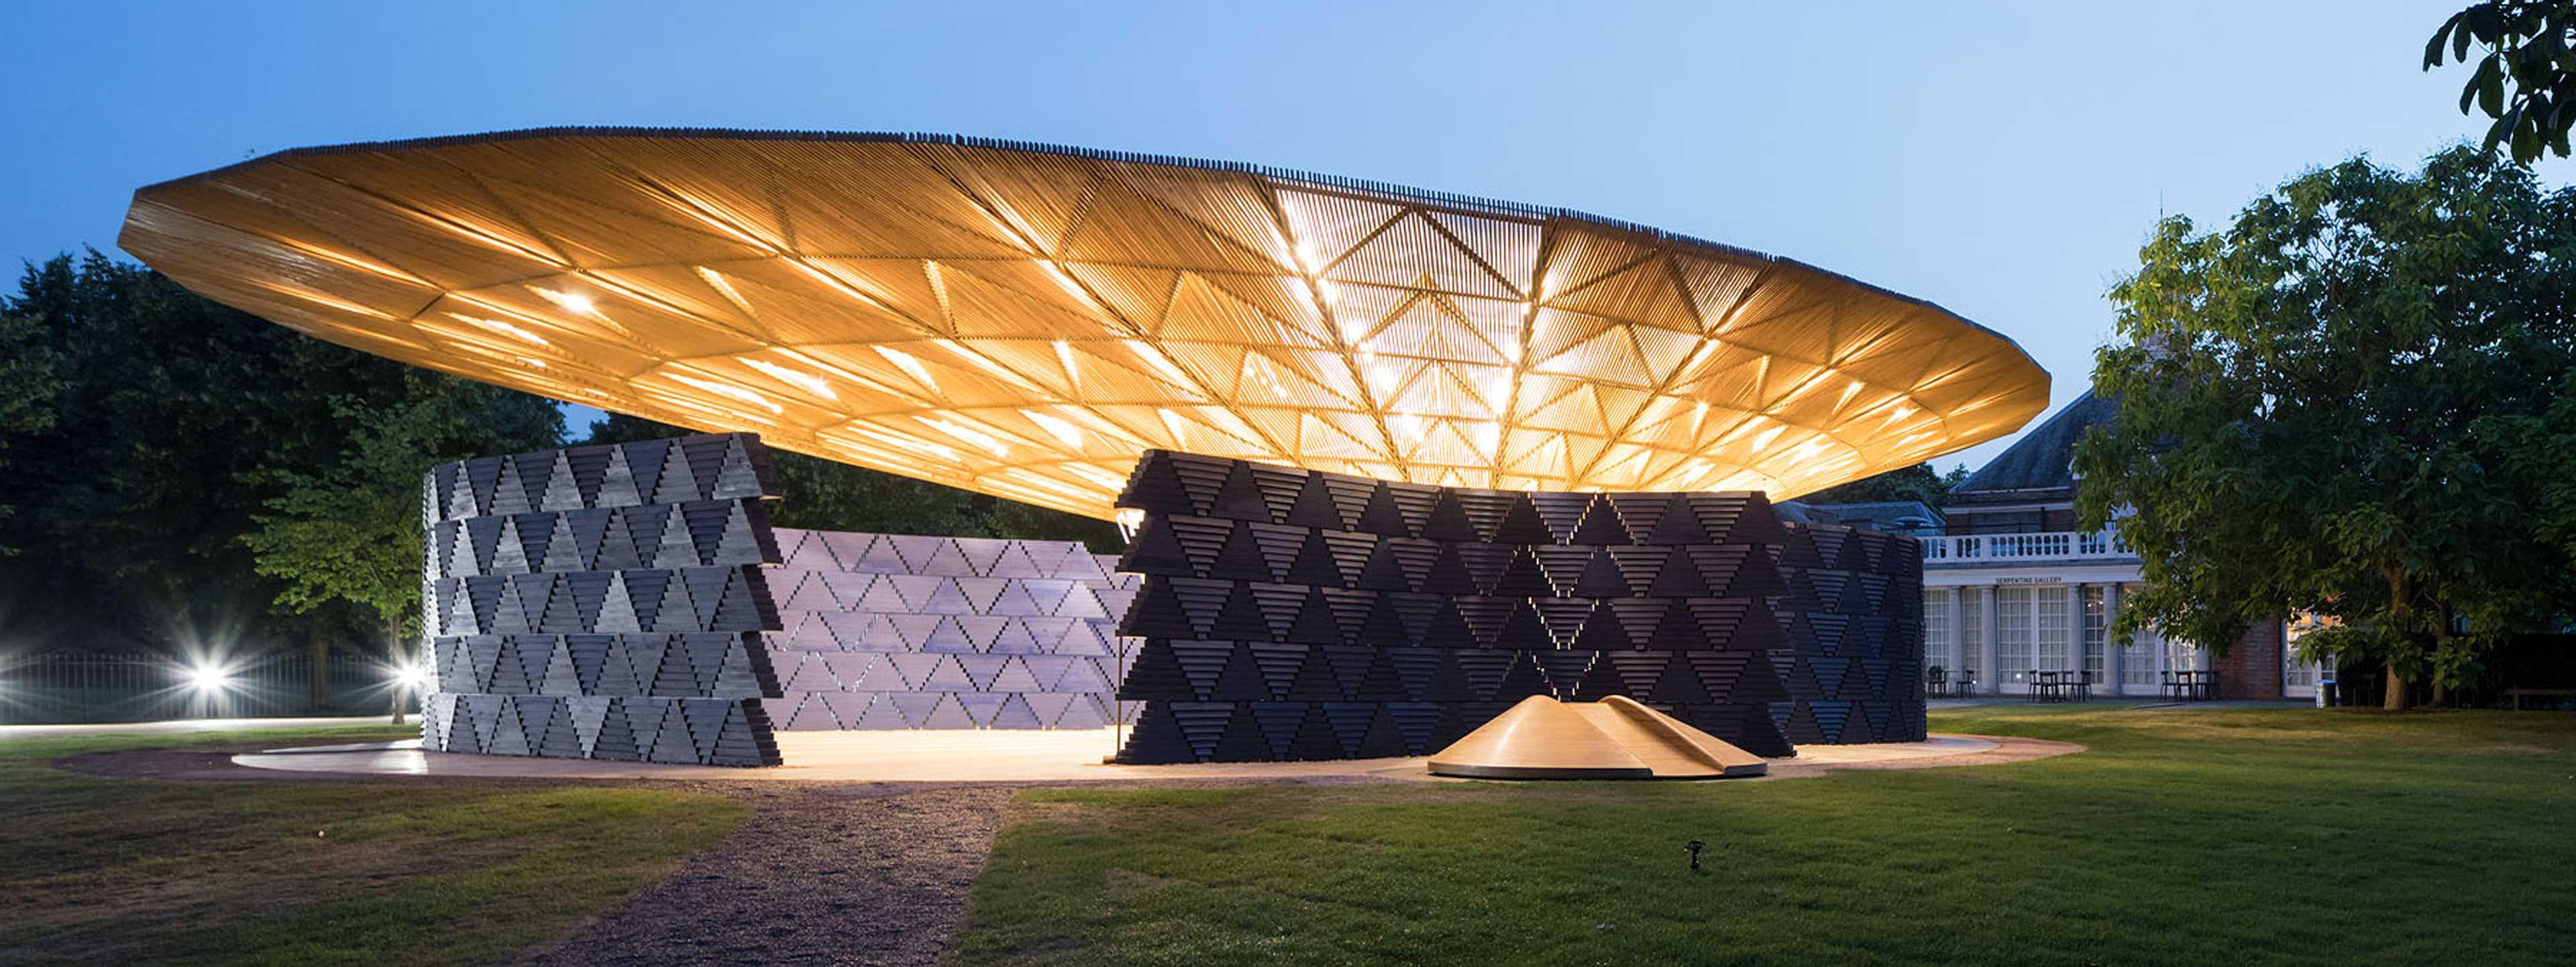 Serpentine Pavilion  - 38 02 41